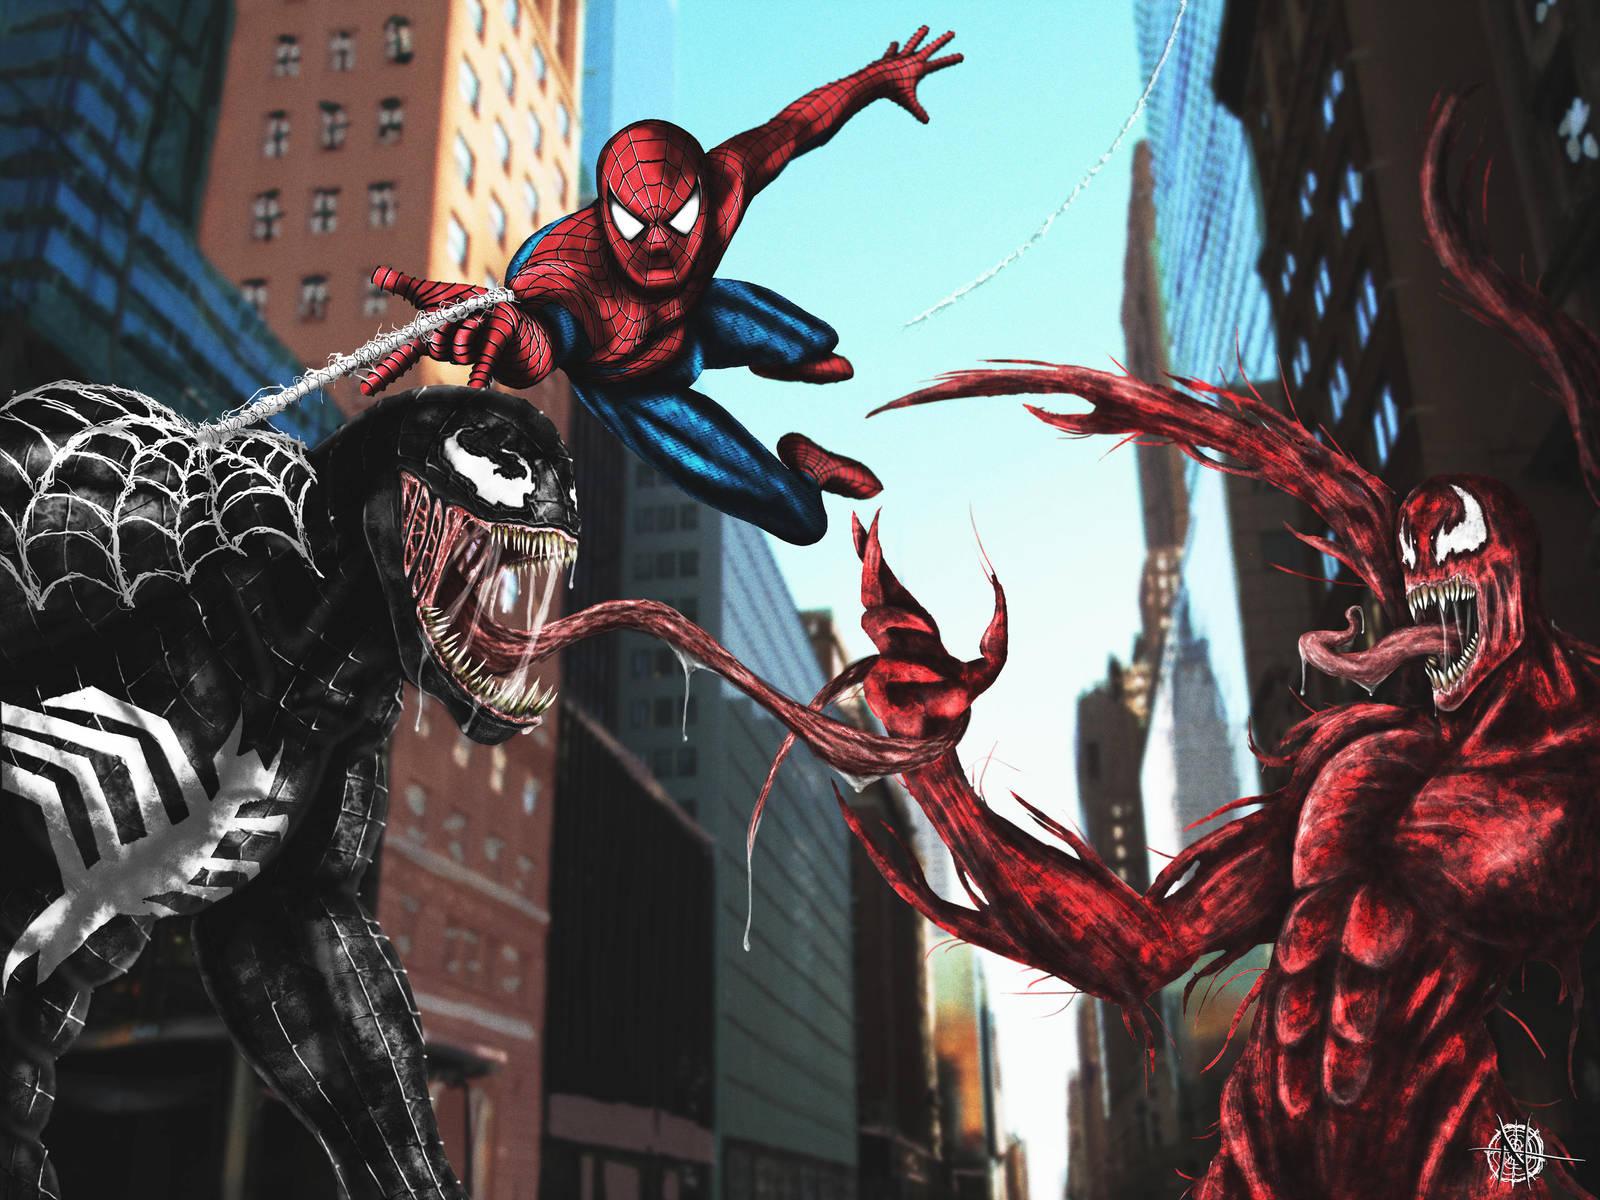 spiderman vs. venom vs. carnage.ezekiel47 on deviantart